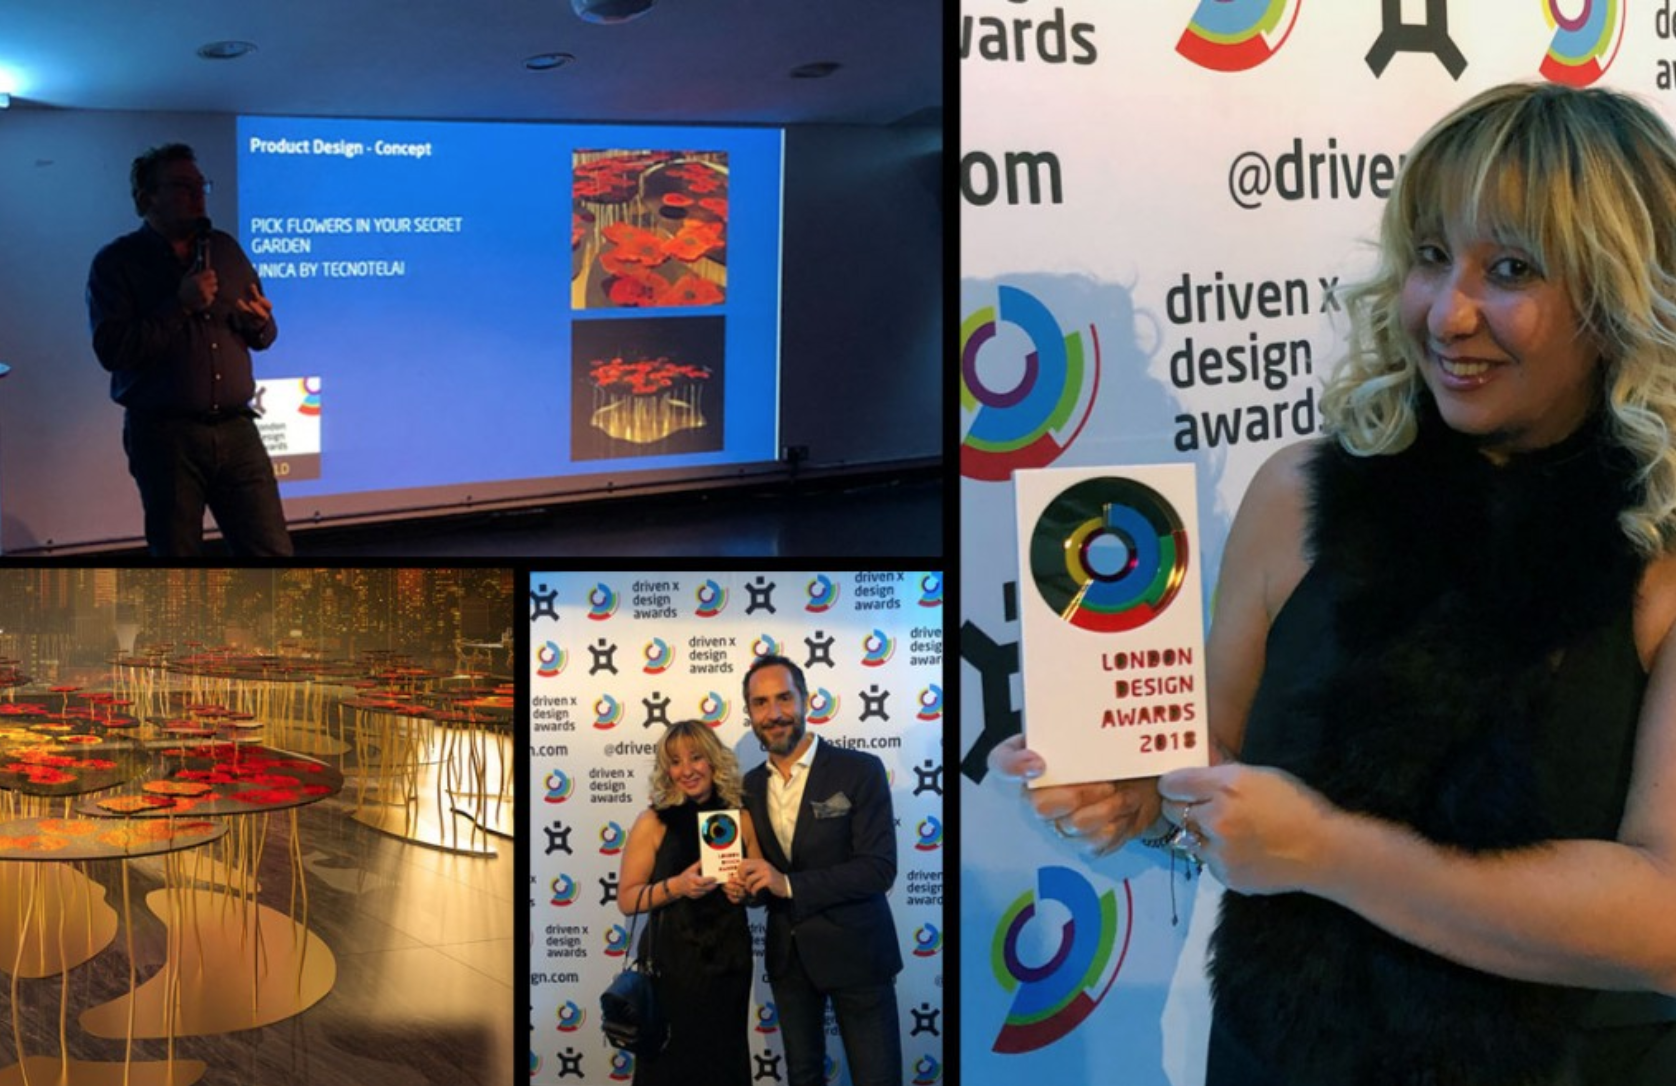 UNICA WINS THE GOLD AWARD AT THE LONDON DESIGN AWARD 2018 WITH PAPAVERI